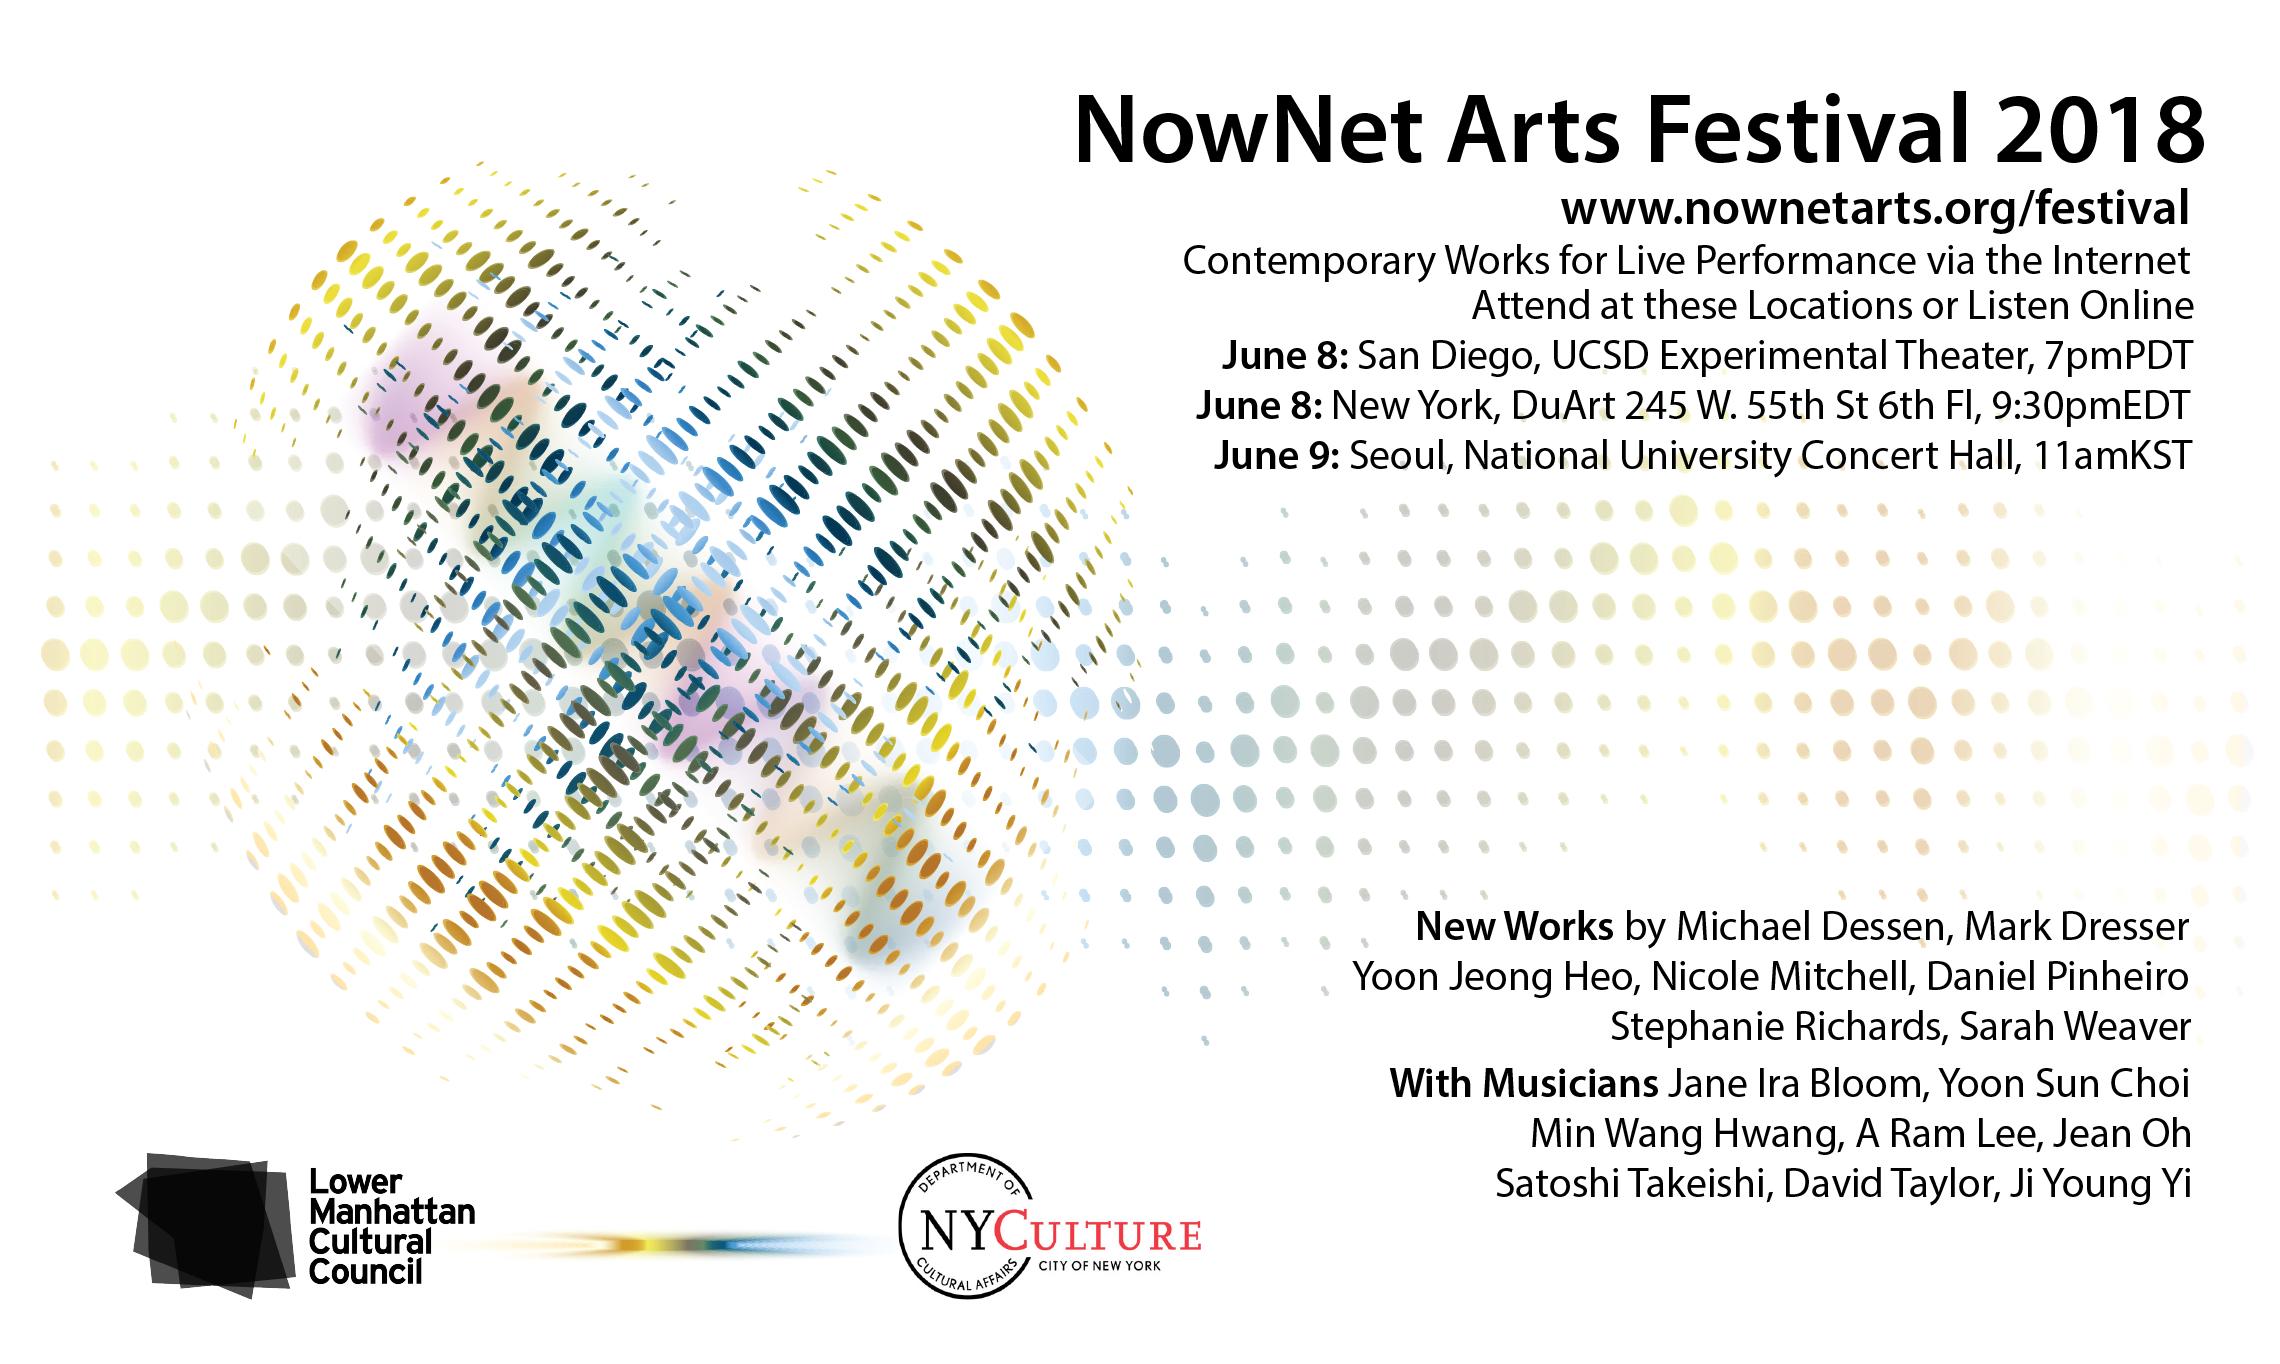 nownet festival image copy.jpg